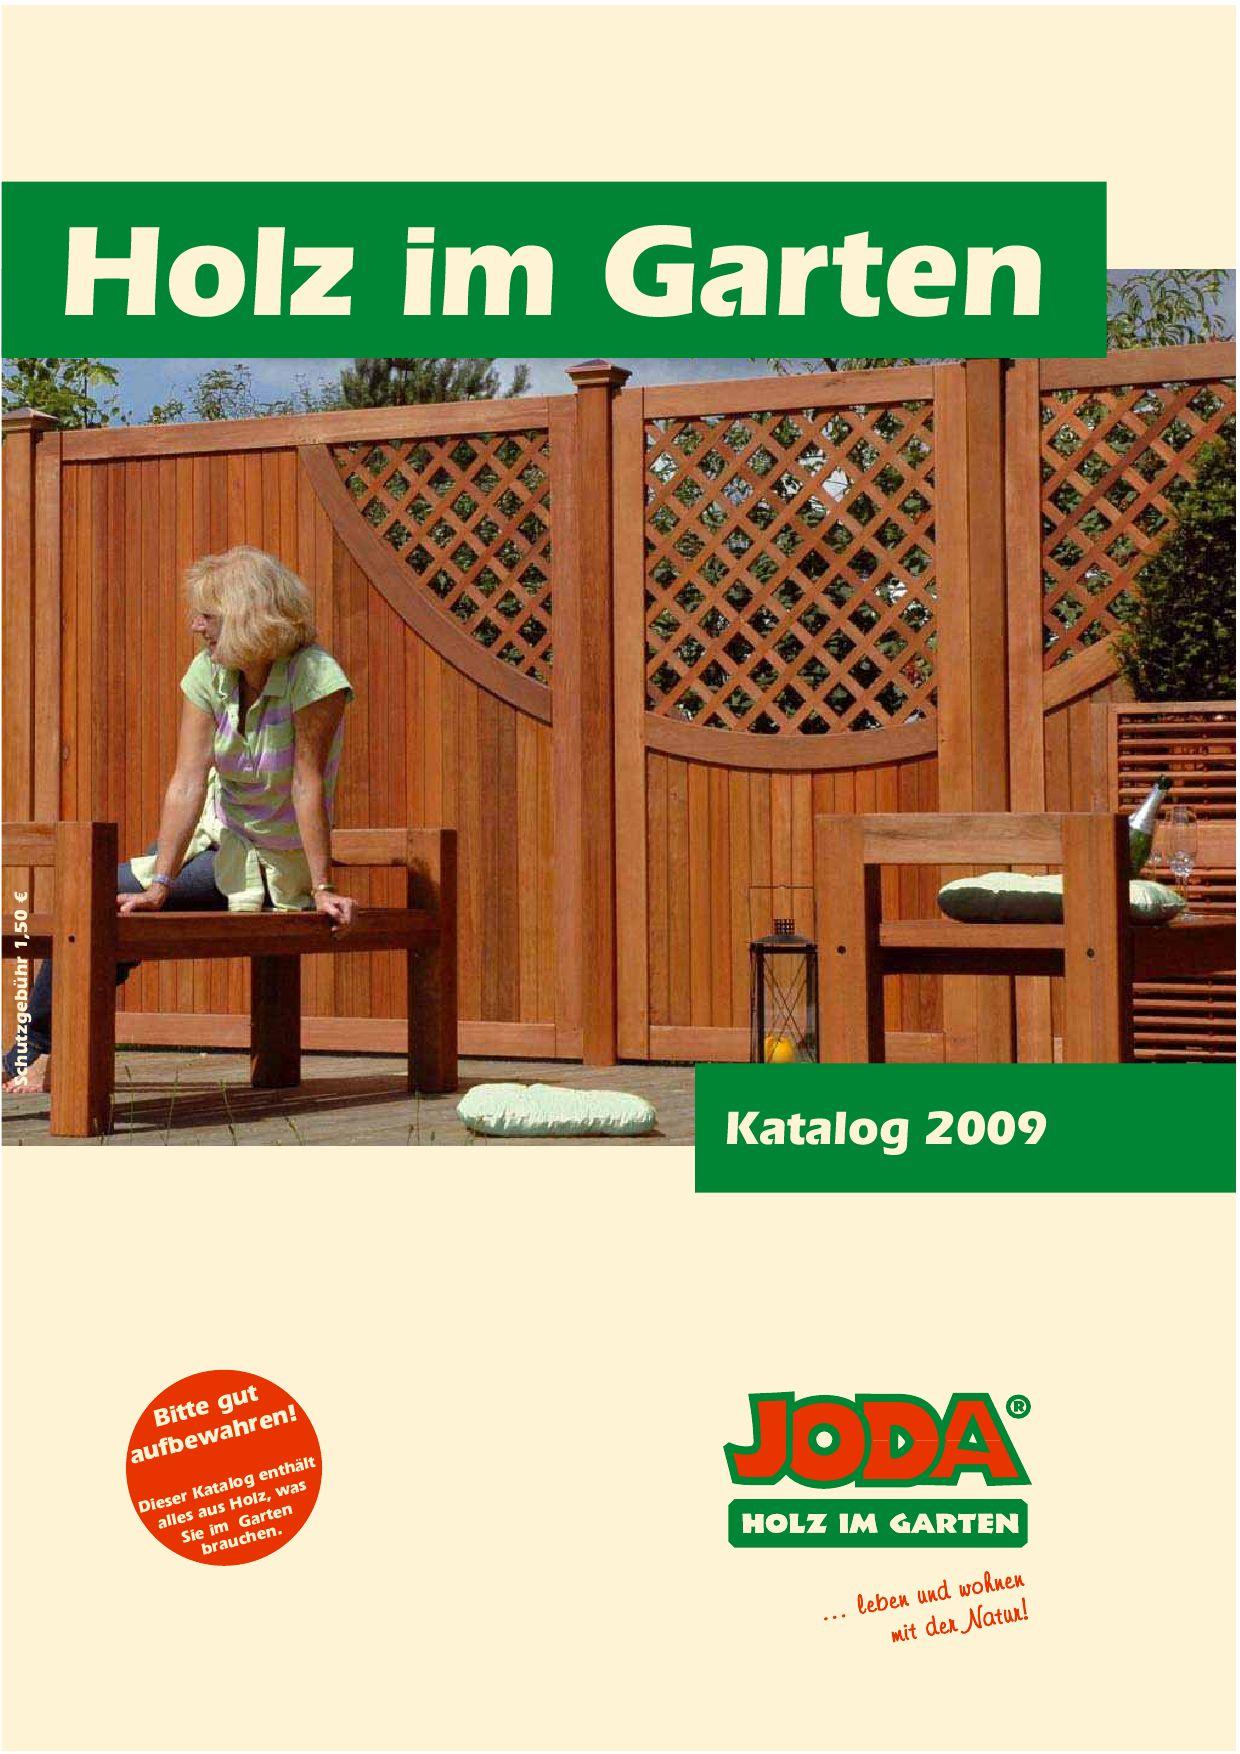 JODA Pforte 100x80//90 Zaunpforte Zaun Vorgartenzaun Holz Gartenzaun Pinie